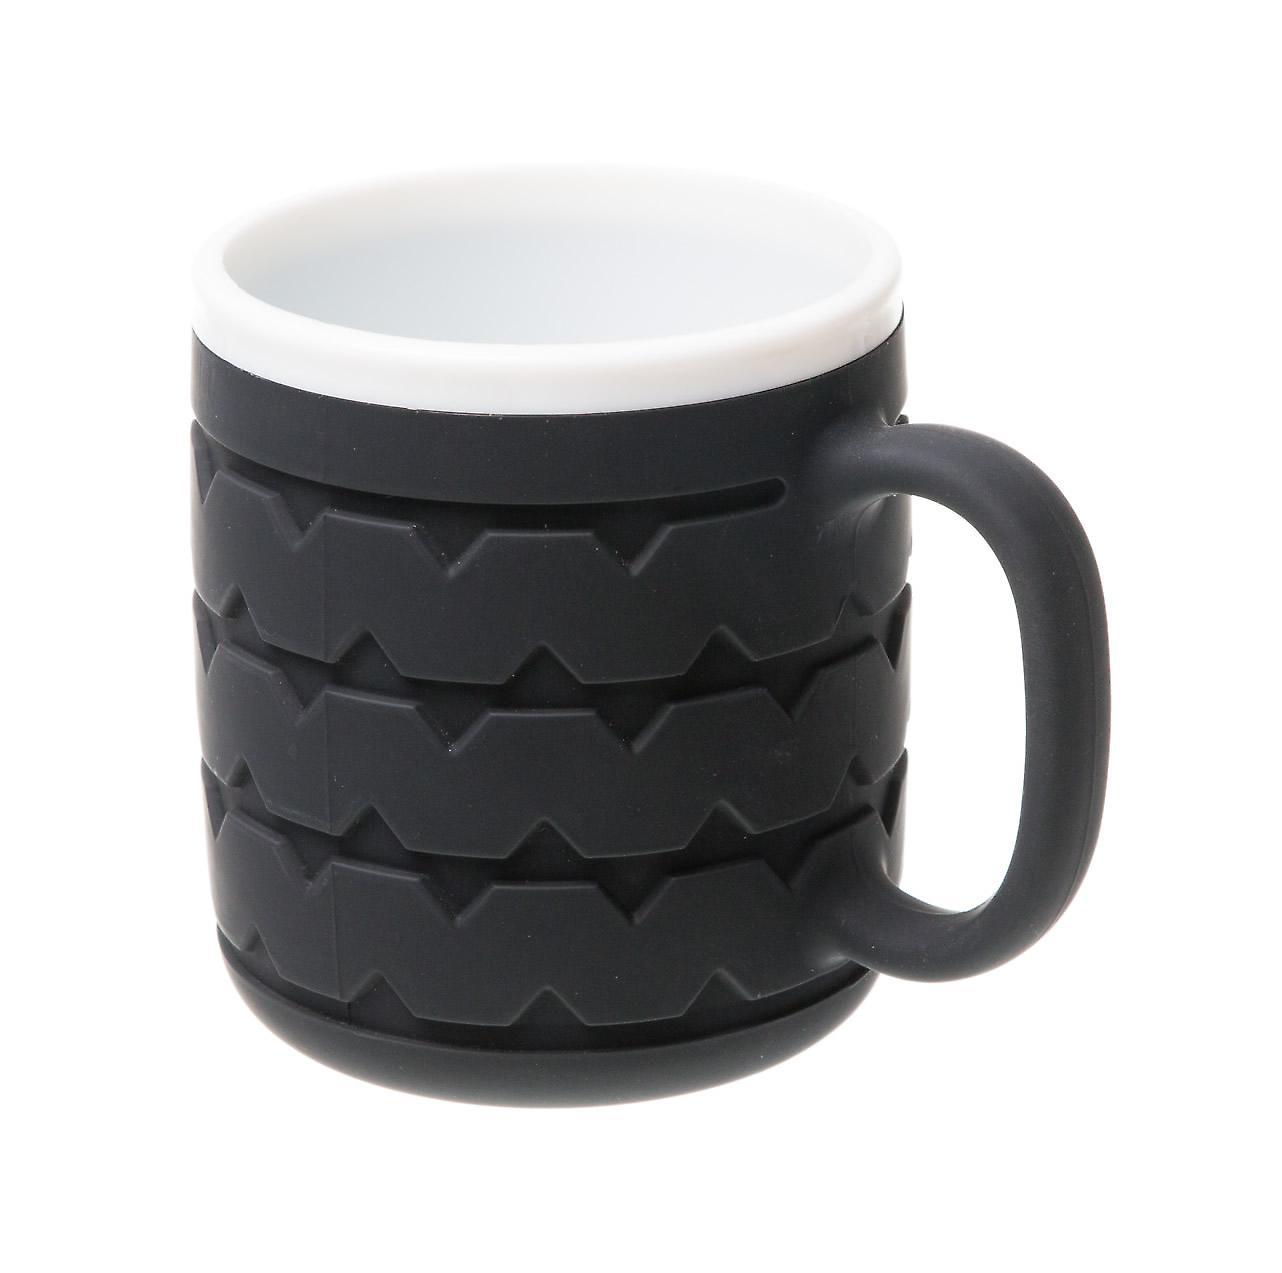 Wrenchware Car Wheel Tyre Mug - White Wall